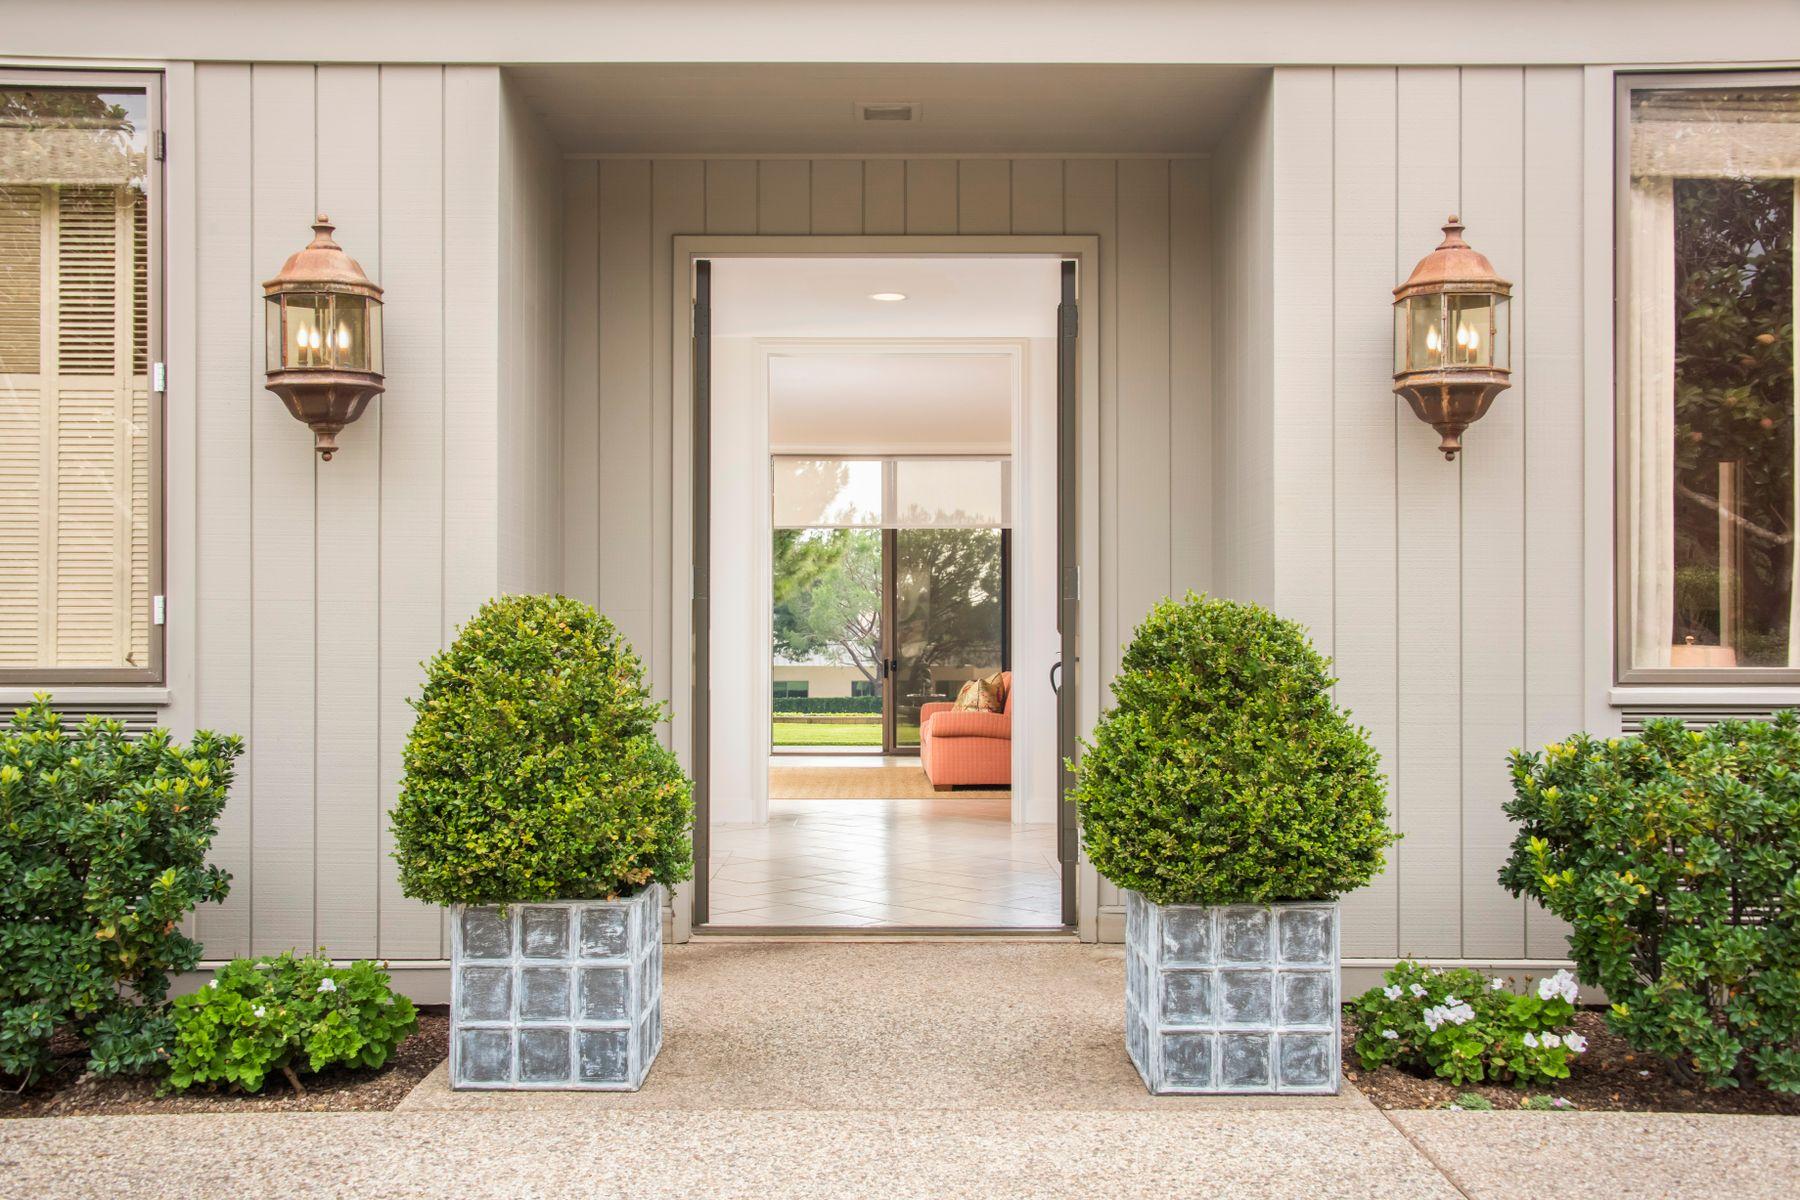 Single Family Homes for Sale at Birnam Wood Home in Prime Location! 2079 Birnam Wood Drive Santa Barbara, California 93108 United States